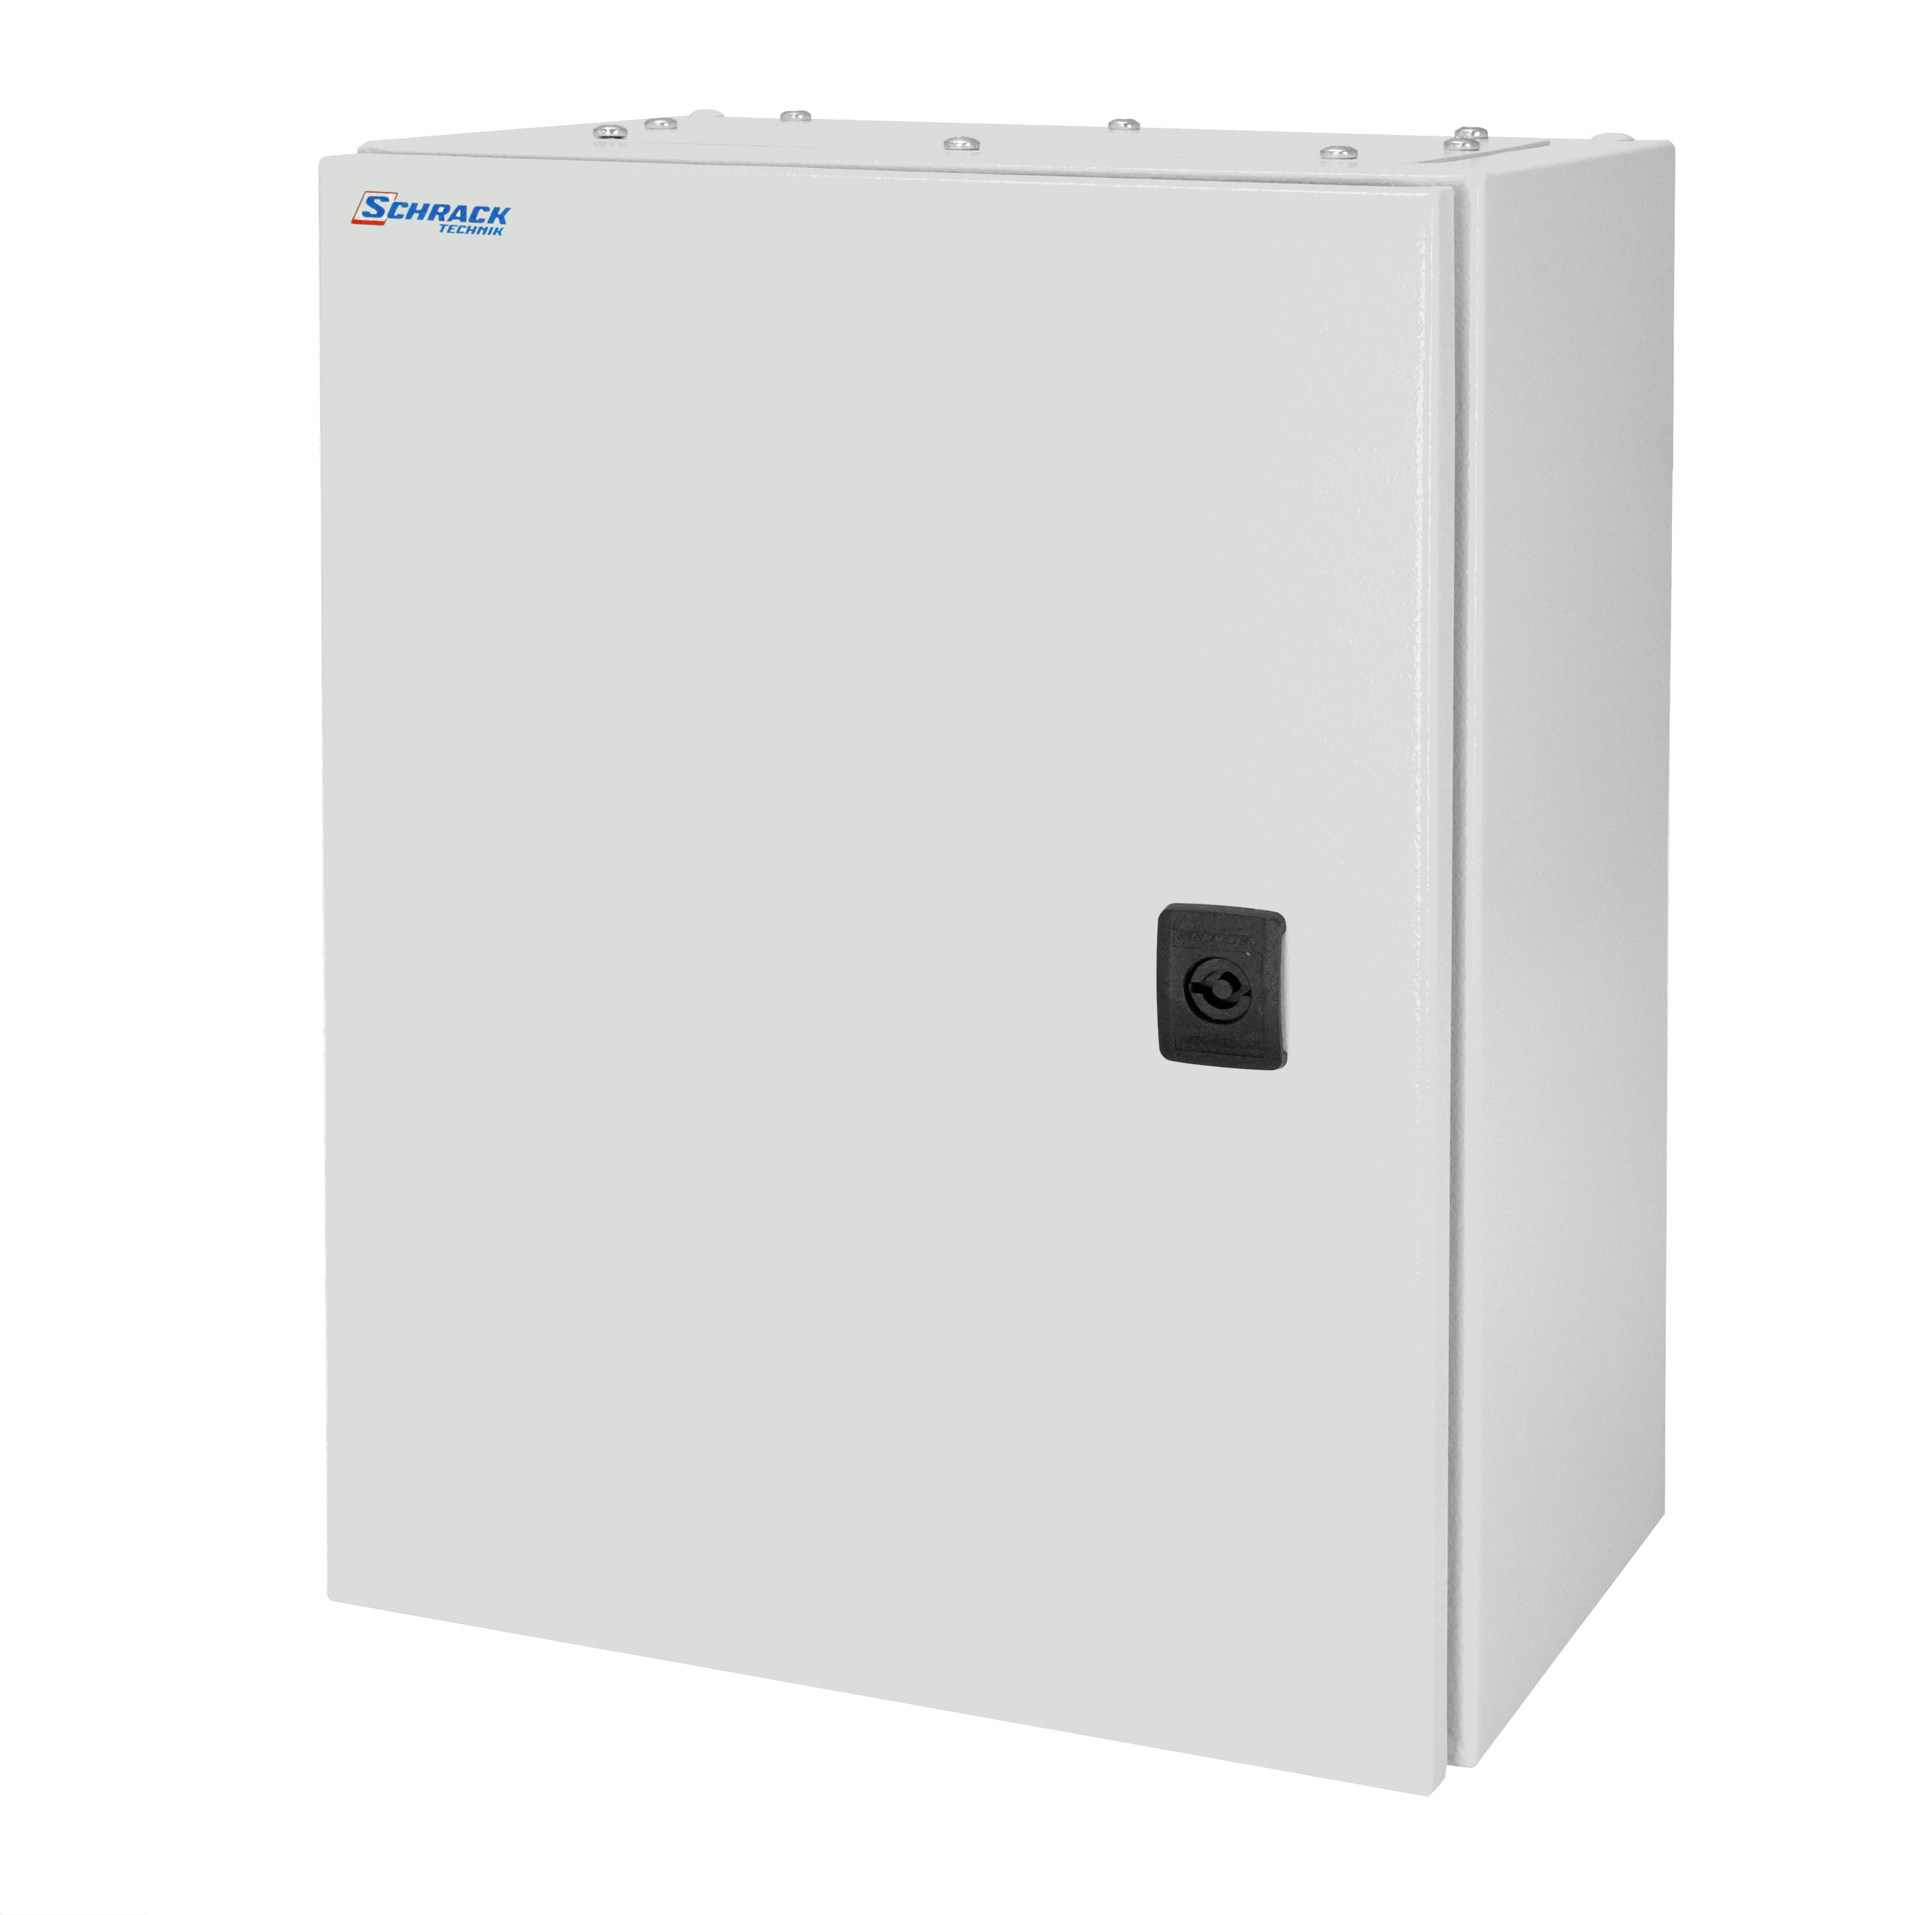 1 Stk Wandschrank Mono IP66 H=1200 B=600 T=300 Stahlblech WSM1206300